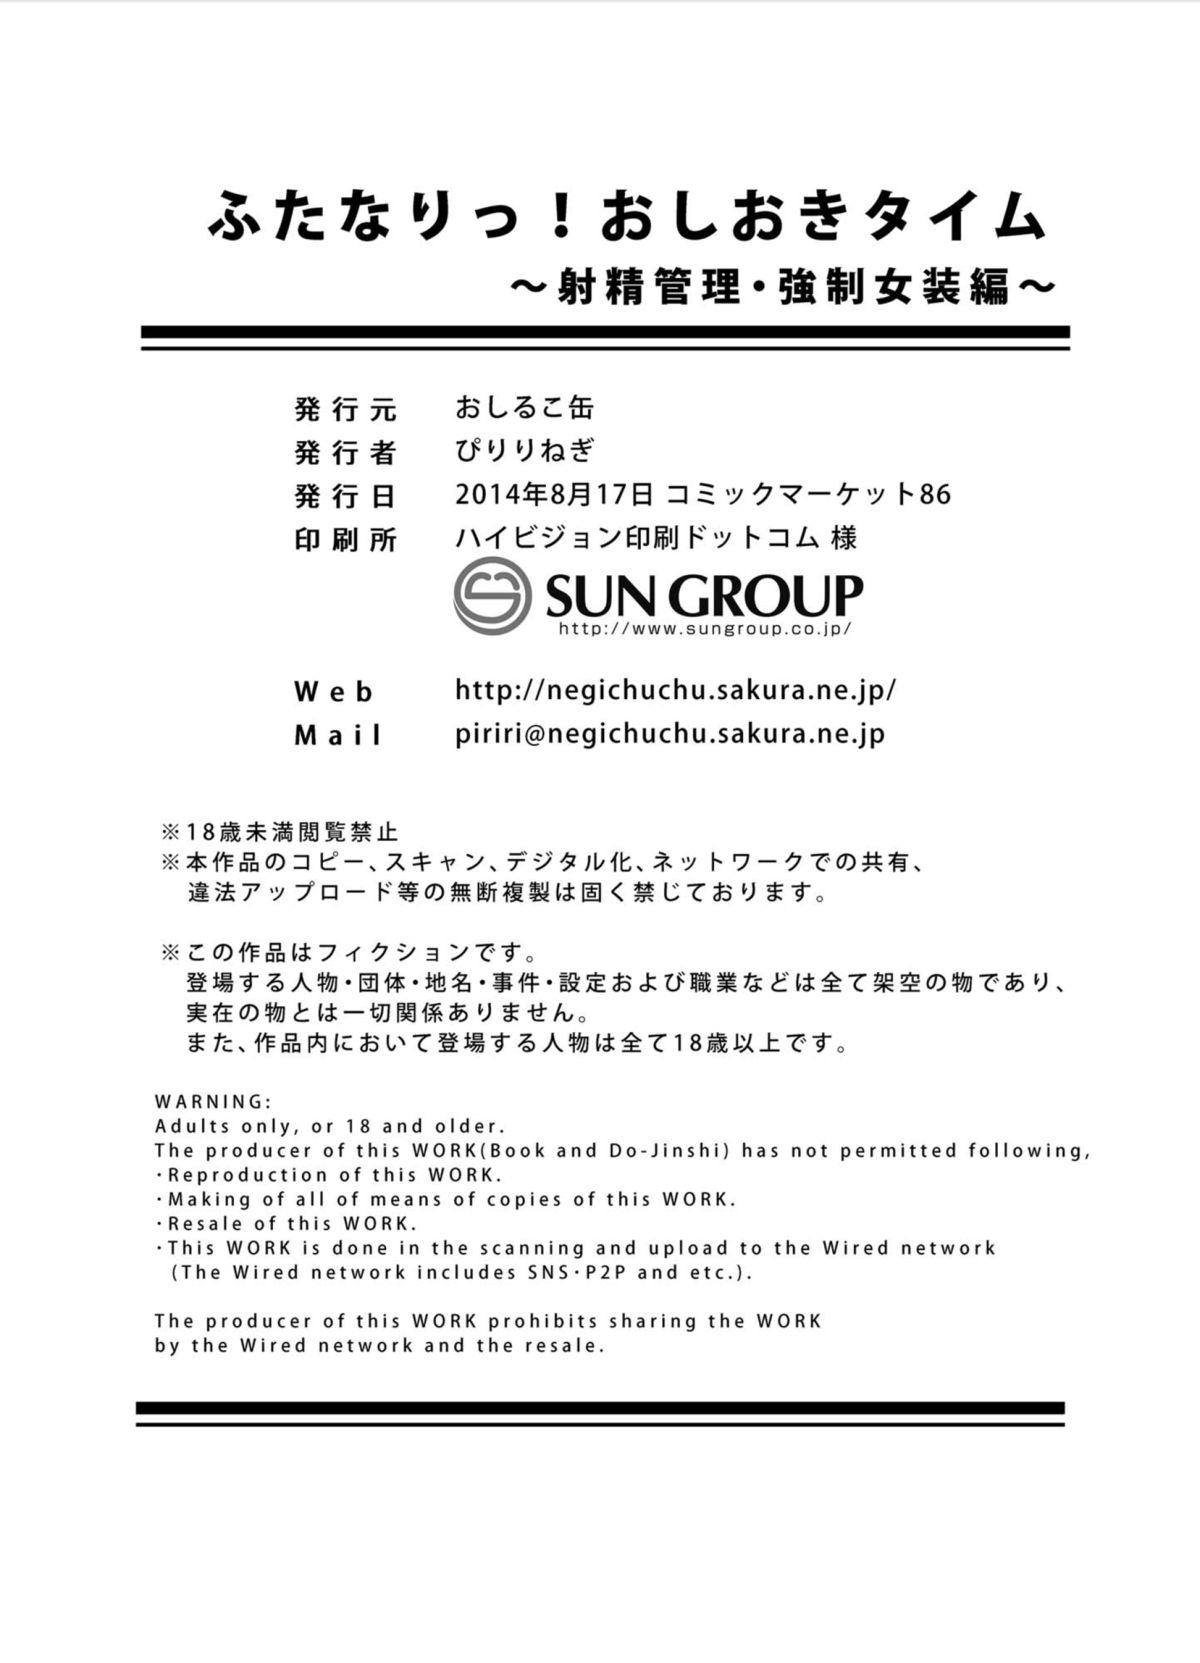 [Oshiruko Kan (Piririnegi)] Futanari! Oshioki Time 2 ~Shasei Kanri Kyousei Josou Hen~ | Futanari! Punishment Time 2 [English] [Forbiddenfetish77] [Digital] 29